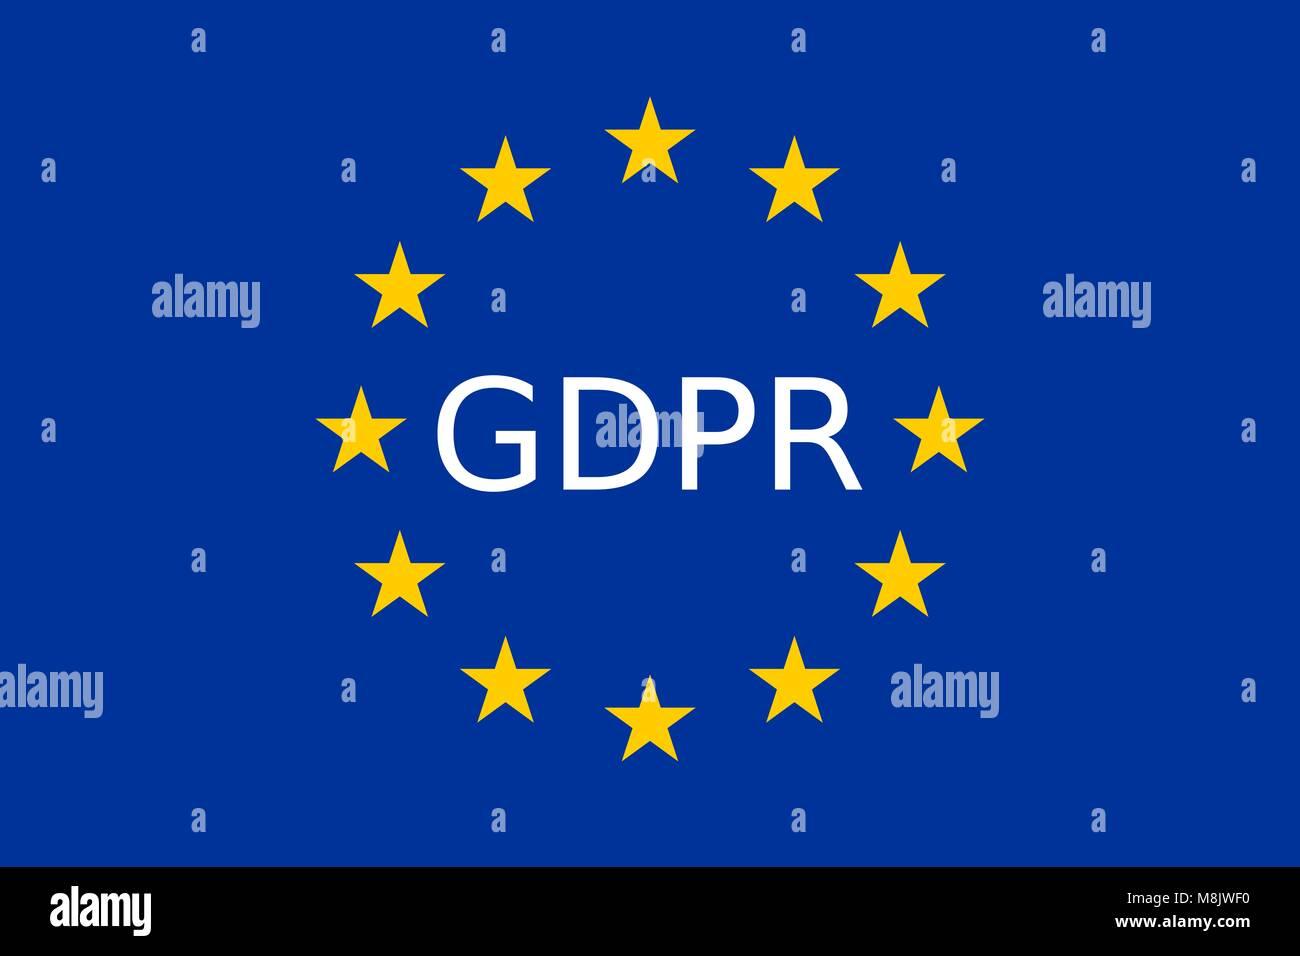 GDPR European Union Data Security Law EU Flag - Stock Image